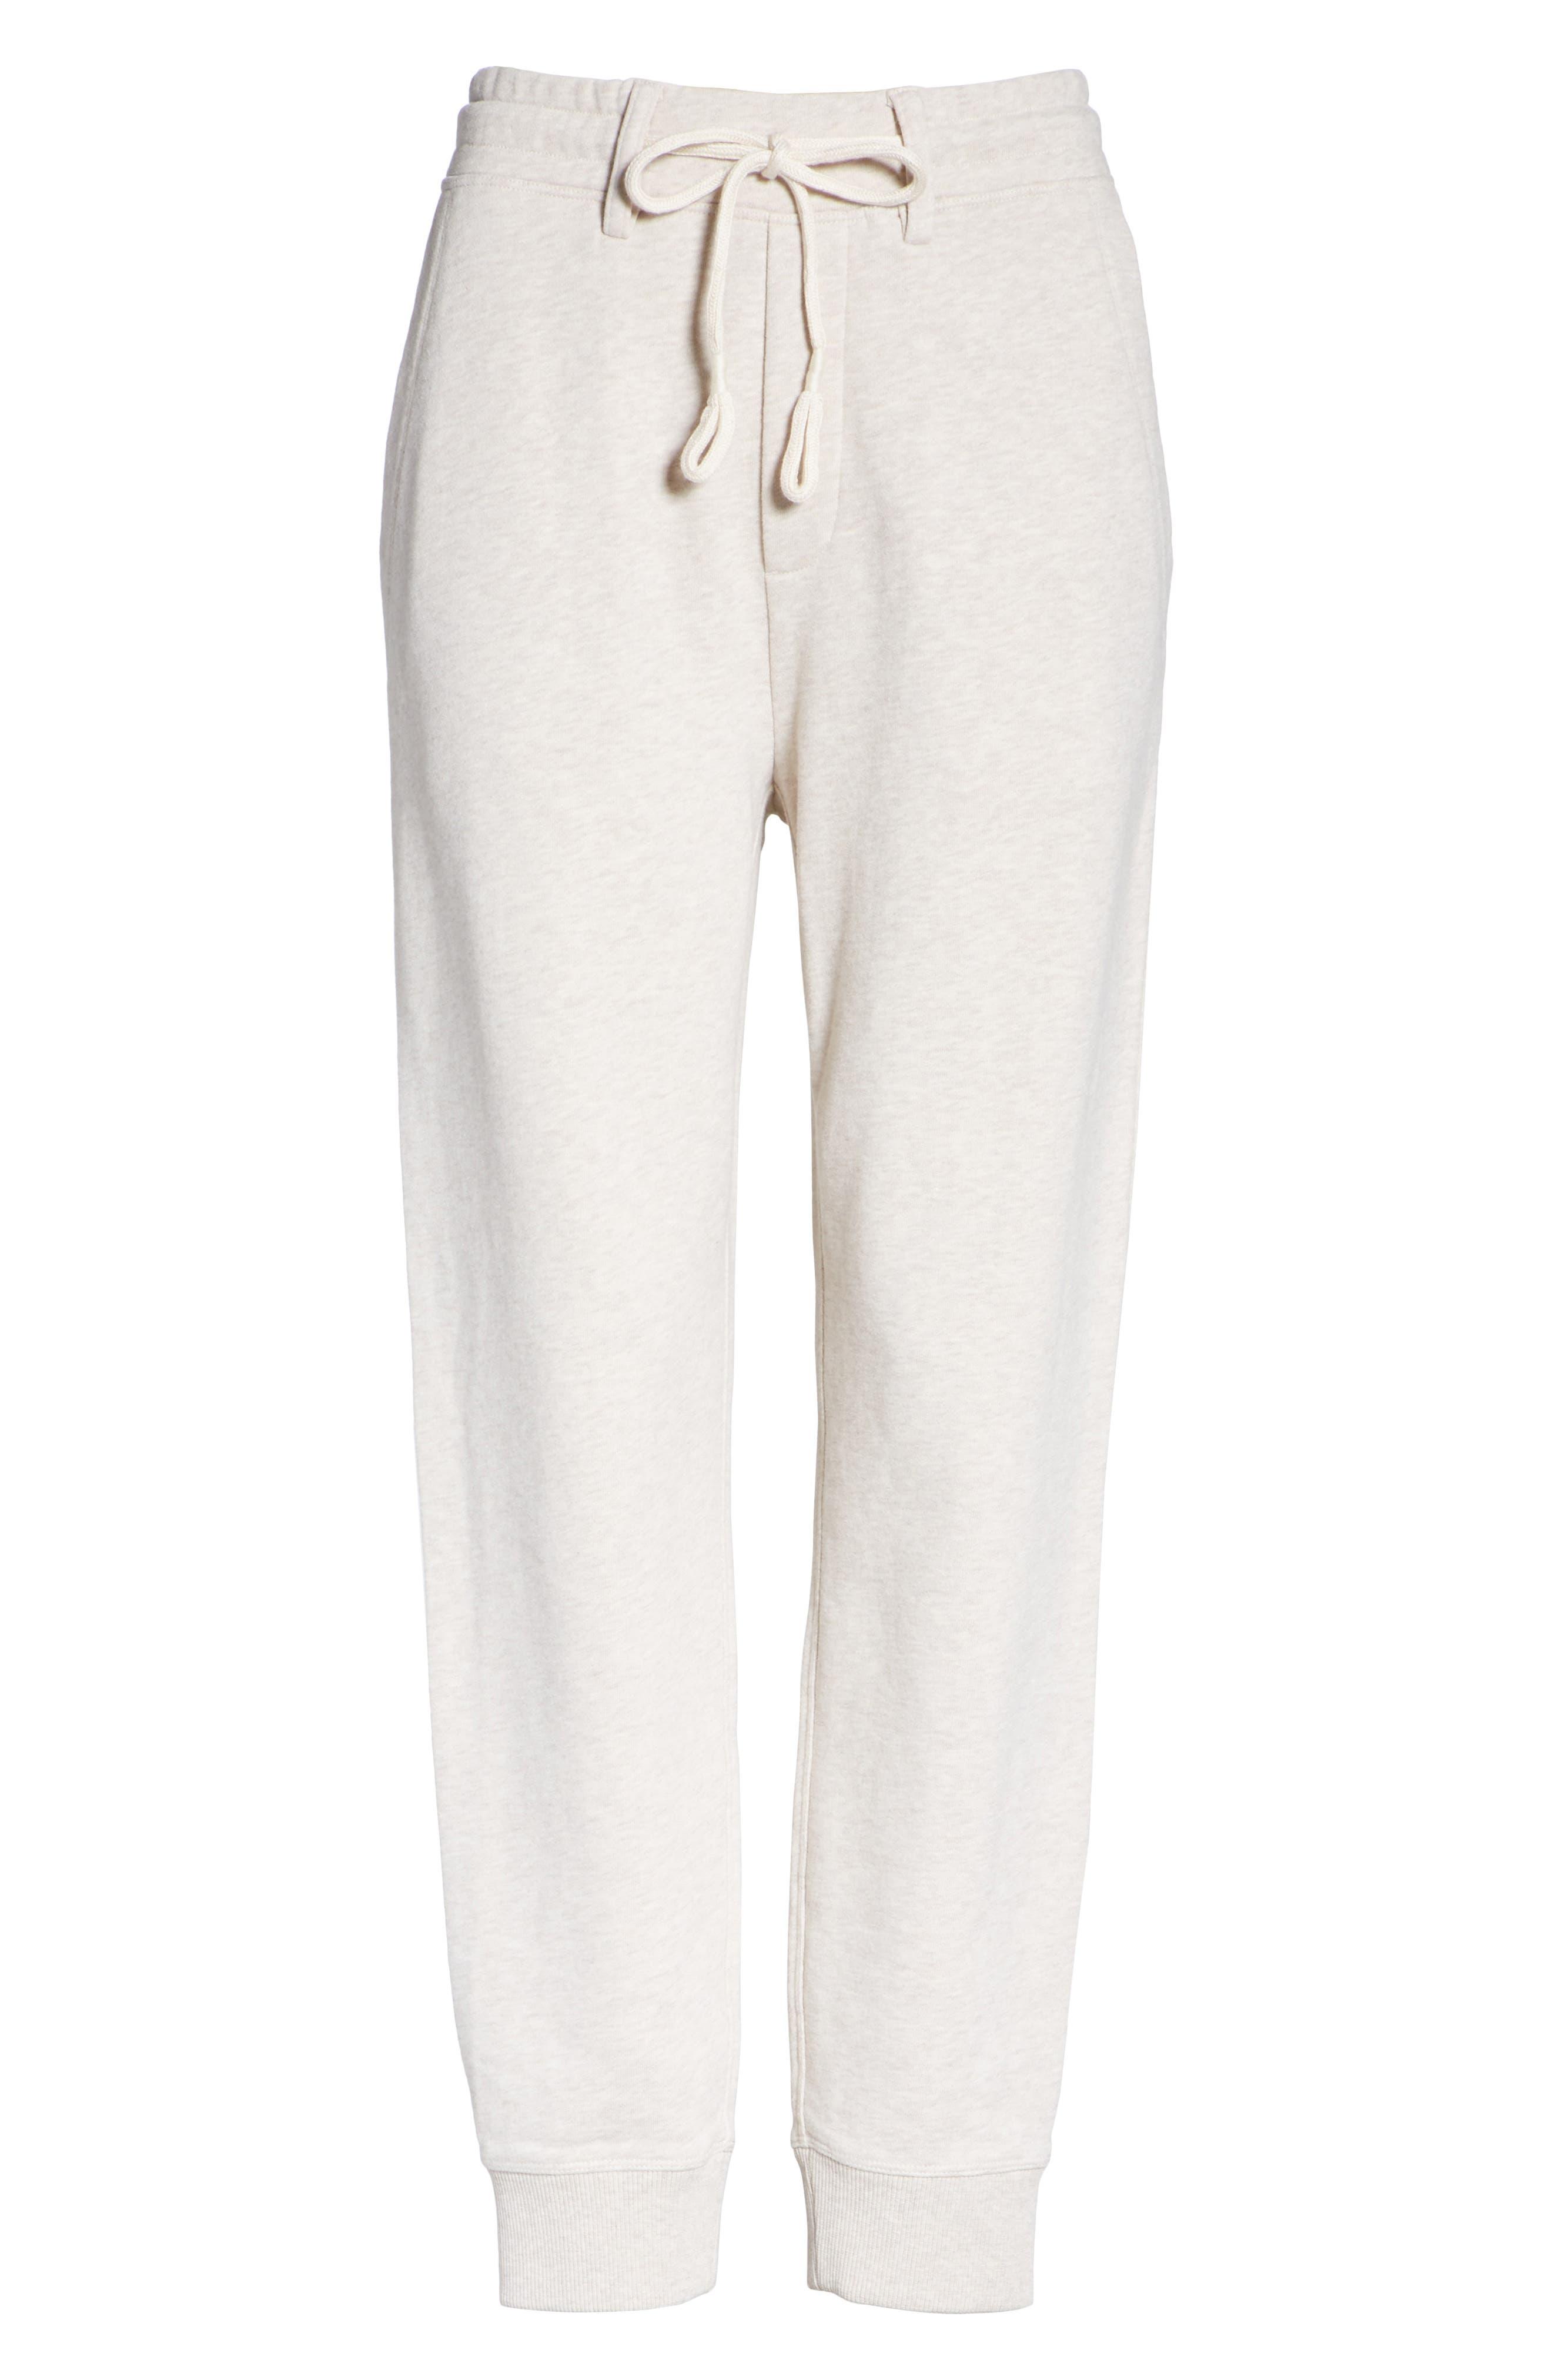 Cotton Drawstring Sweatpants,                             Alternate thumbnail 6, color,